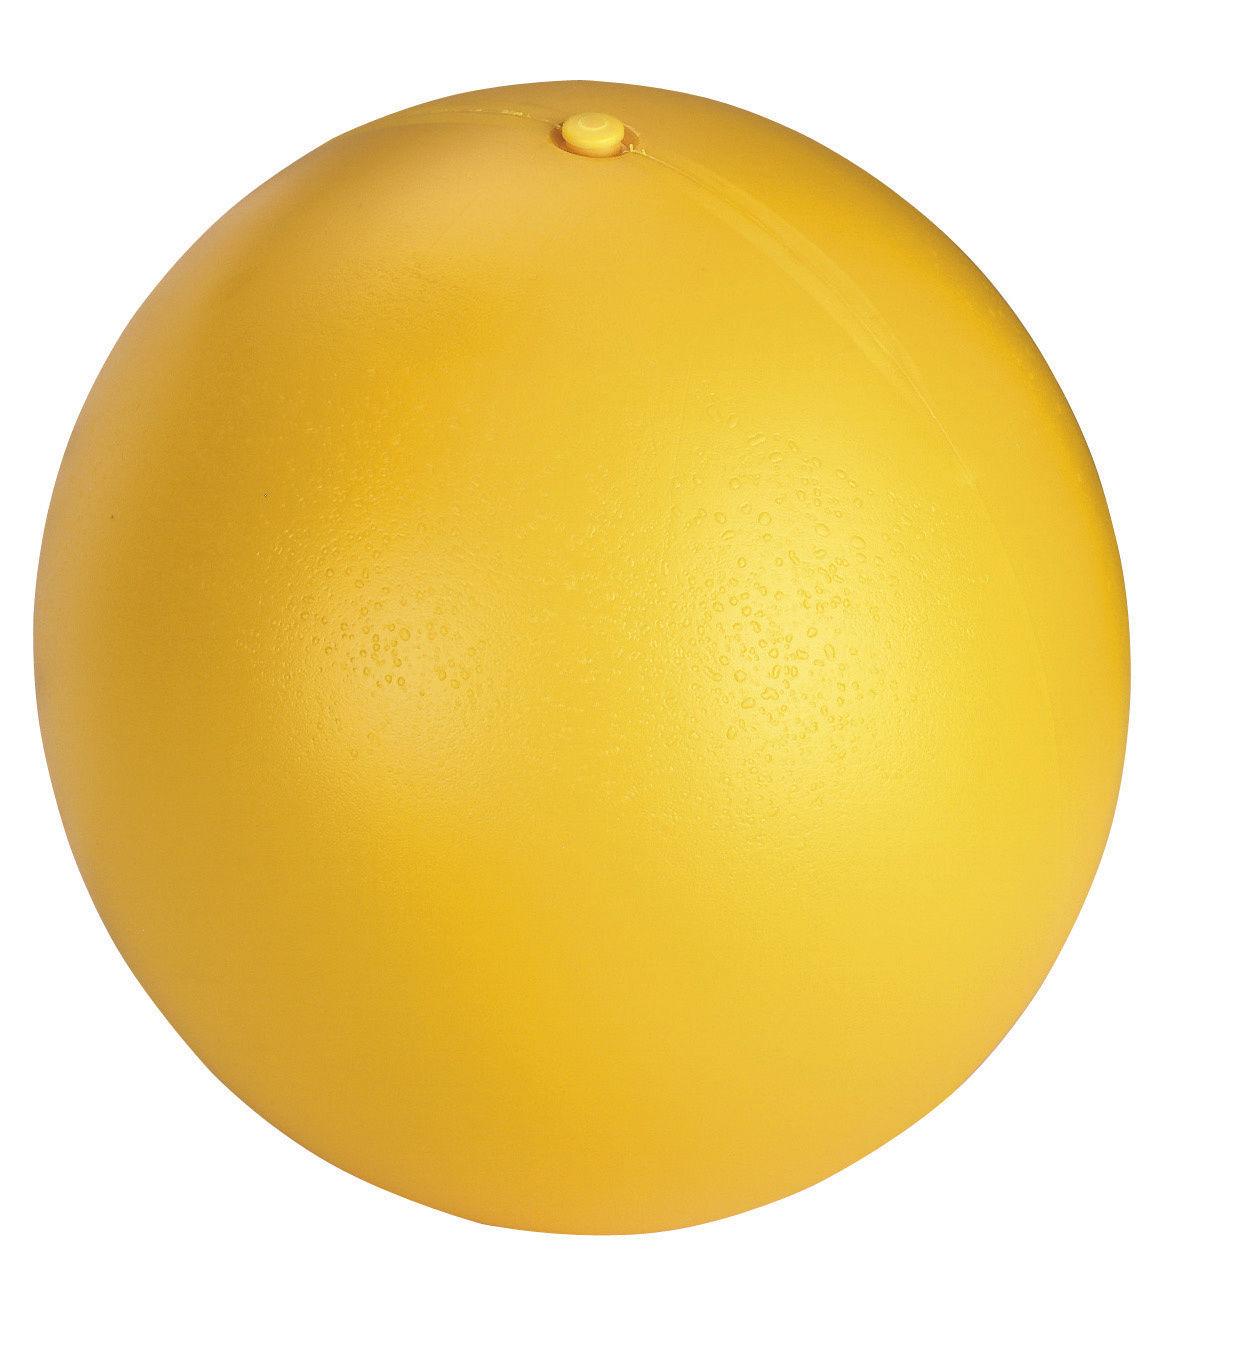 Hundespielball Ø 30 cm, gelb, aus Kunststoff